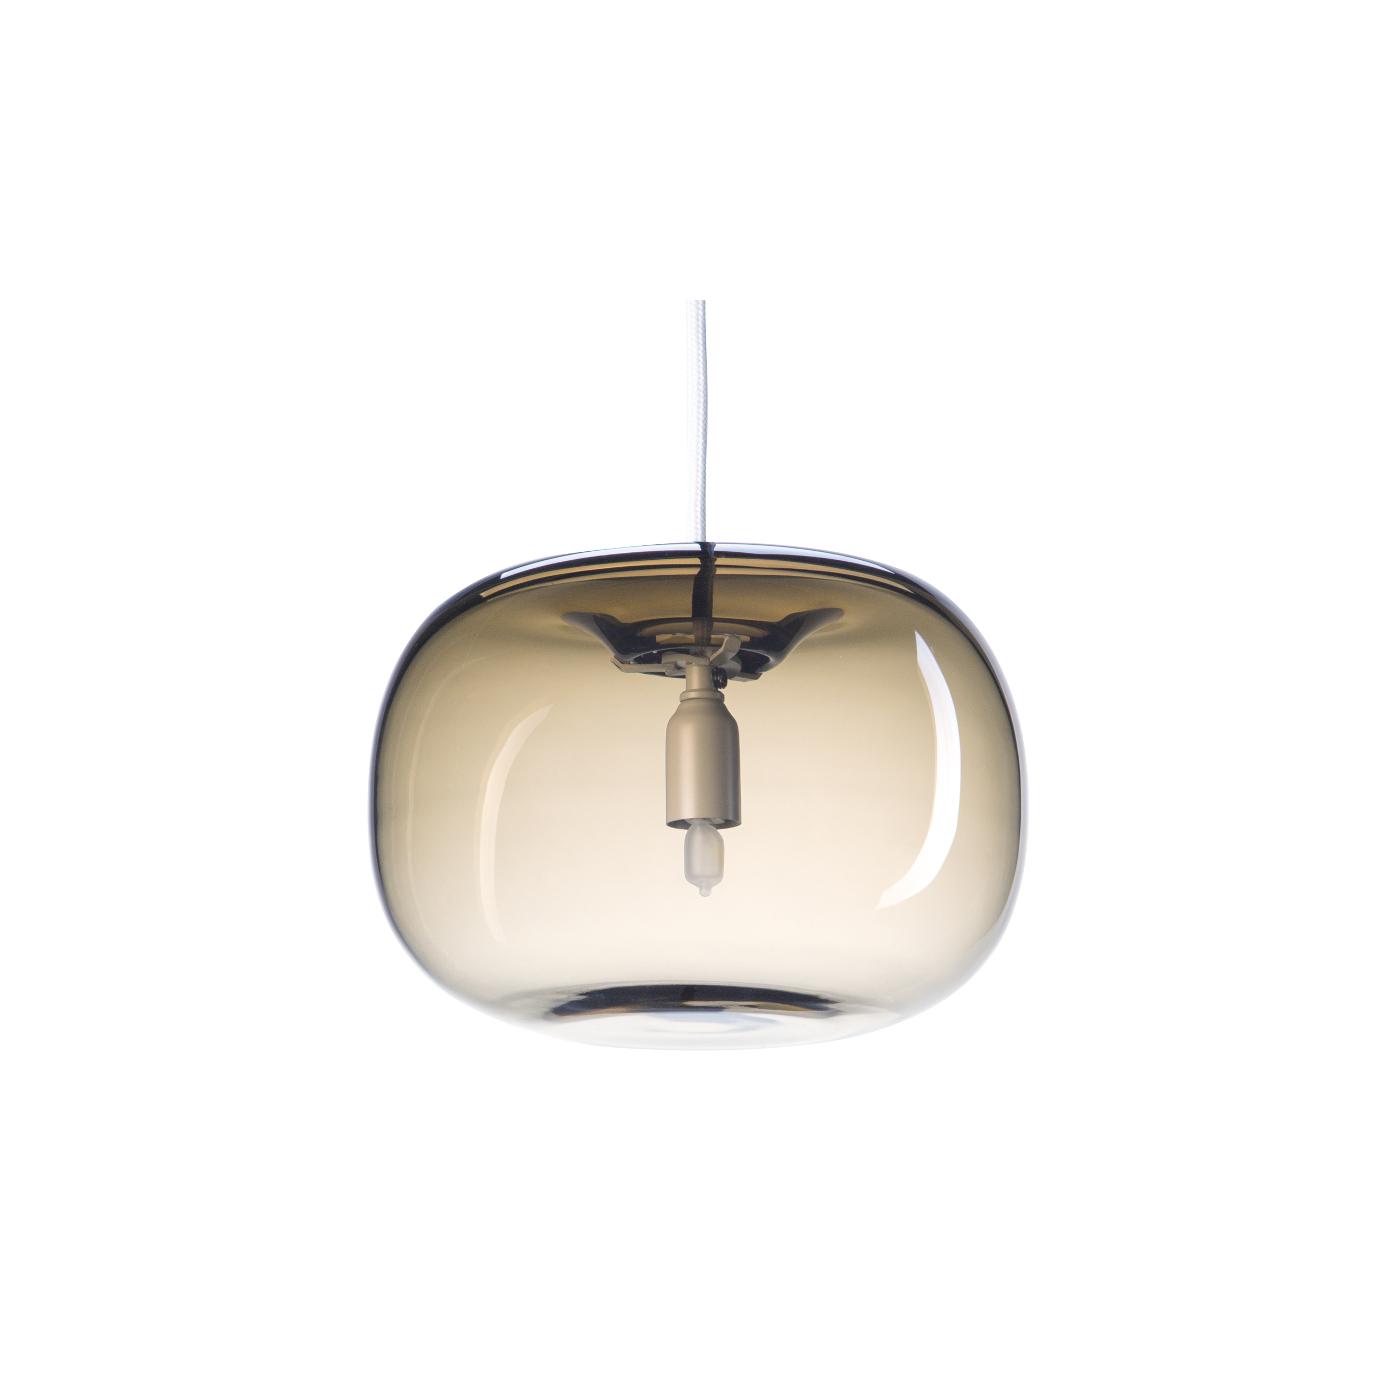 Taklampa PEBBLE Knubbig varmgrå glas, Örsjö belysning